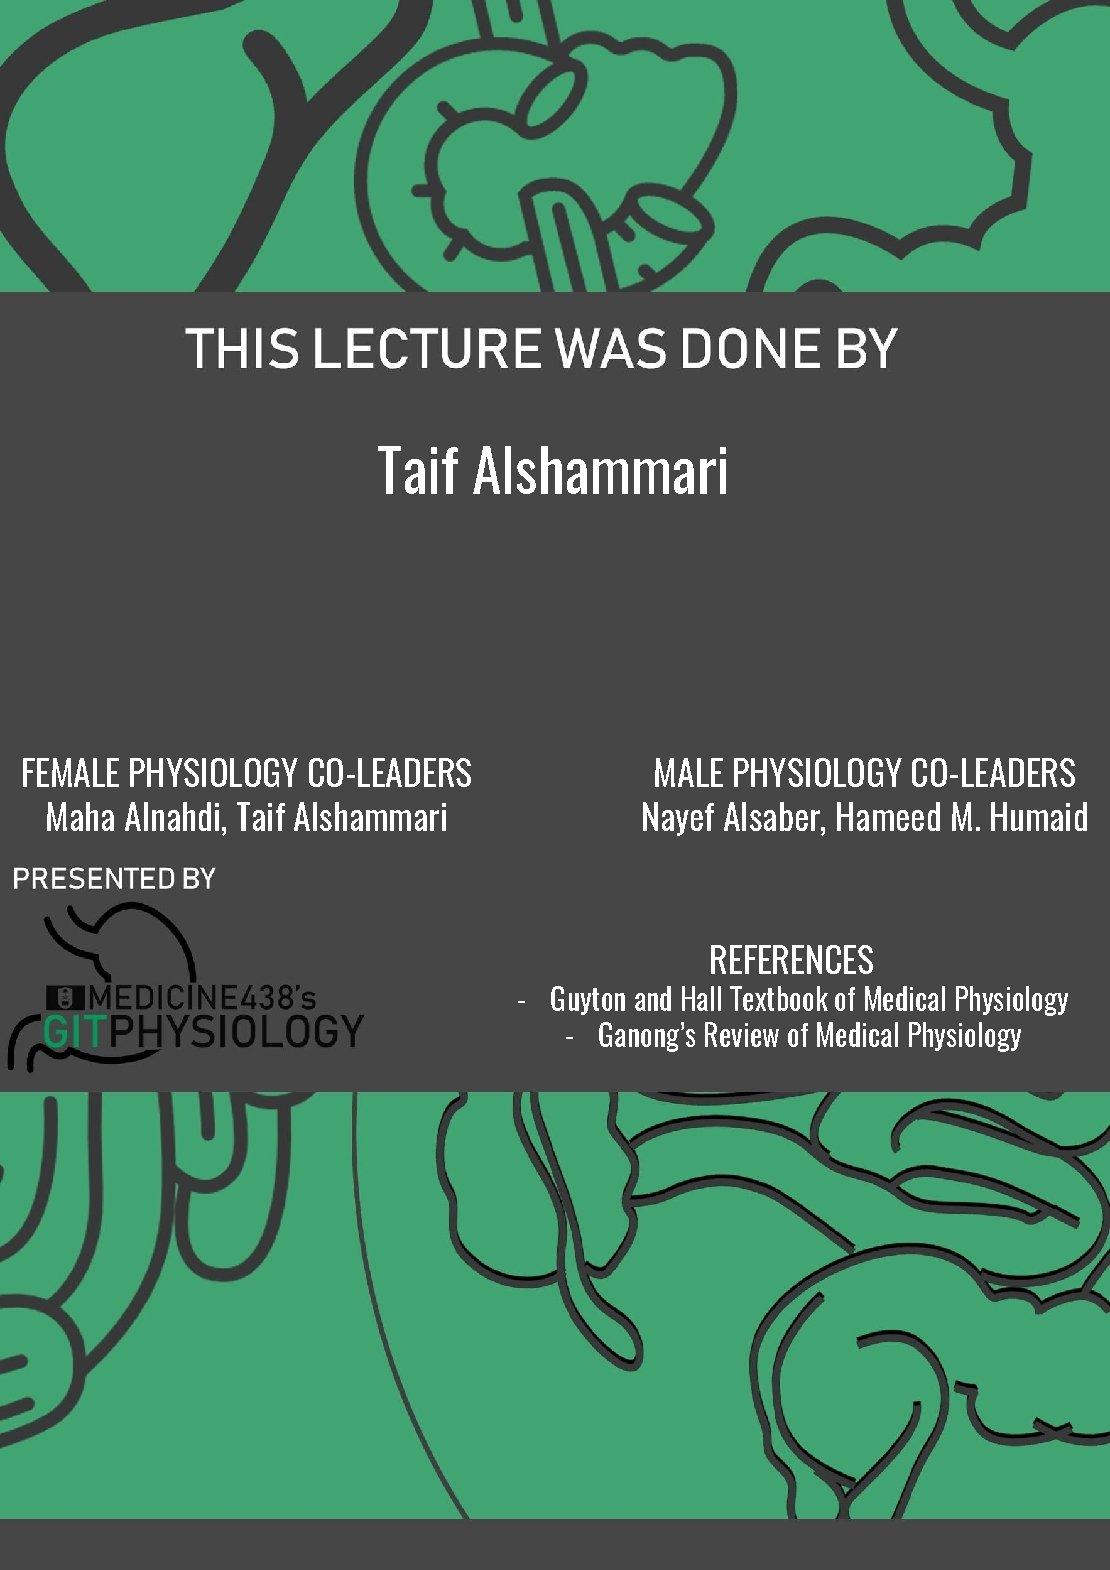 Taif Alshammari FEMALE PHYSIOLOGY CO-LEADERS Maha Alnahdi, Taif Alshammari MALE PHYSIOLOGY CO-LEADERS Nayef Alsaber,